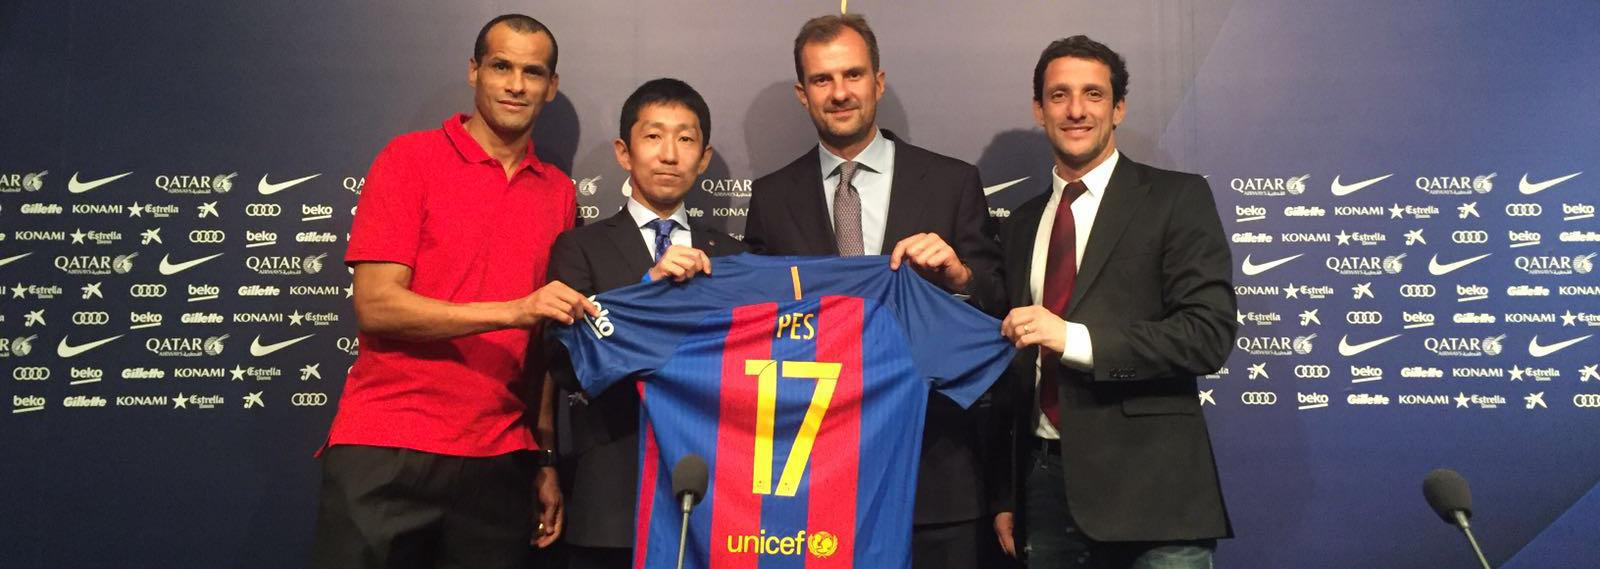 FC Barcelona - Konami